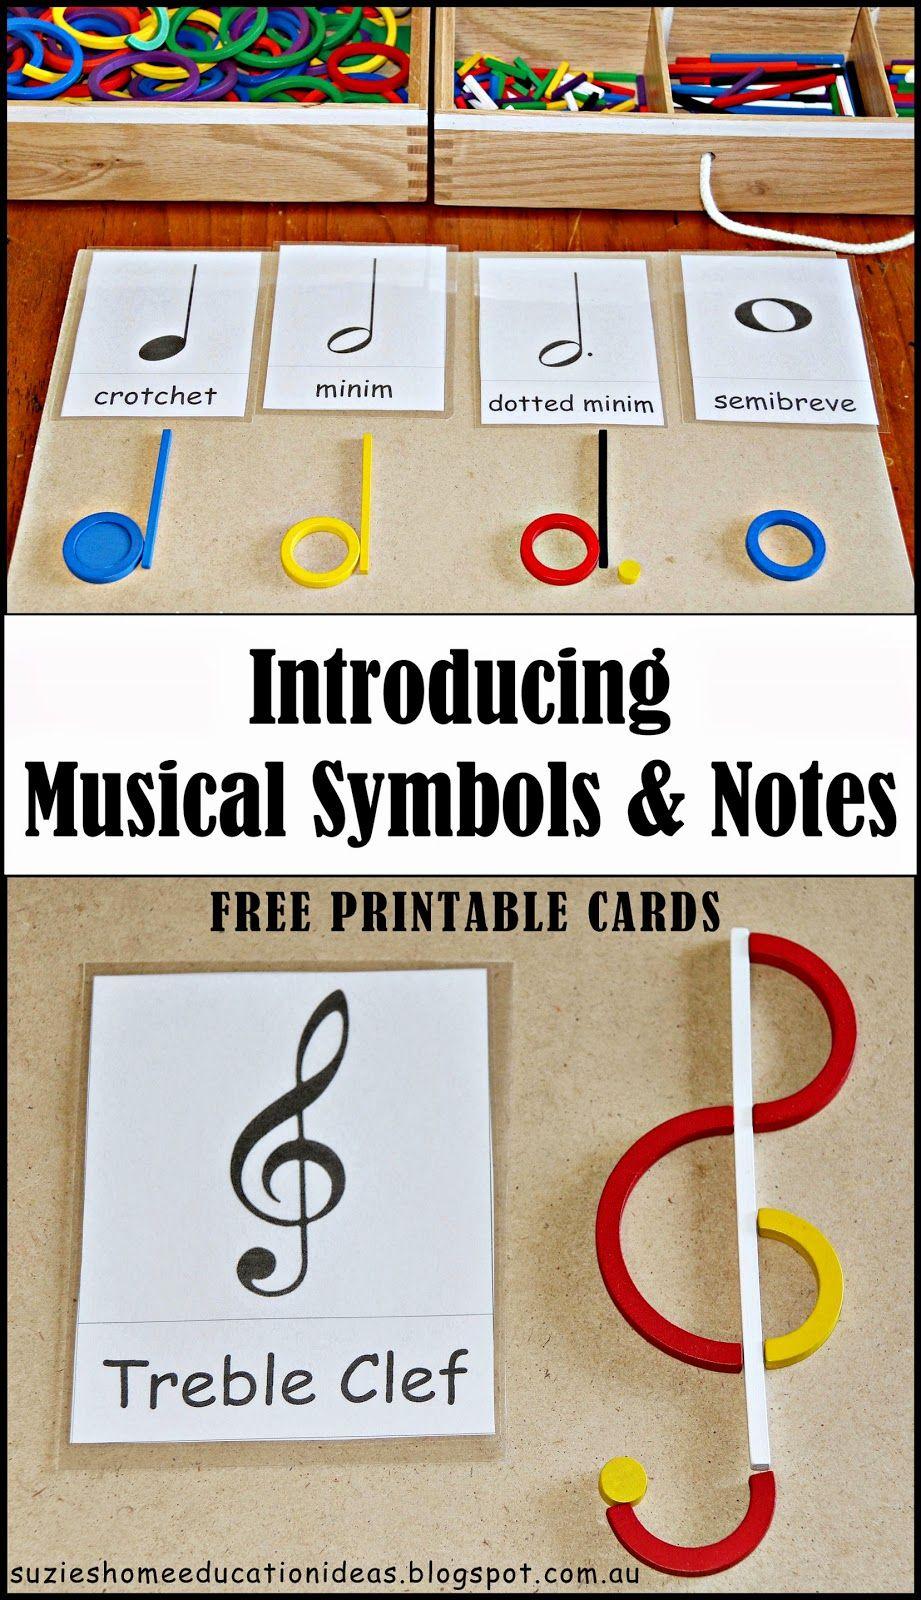 Introducing Musical Symbols and Notes | Beschäftigt, Musik und Kreativ